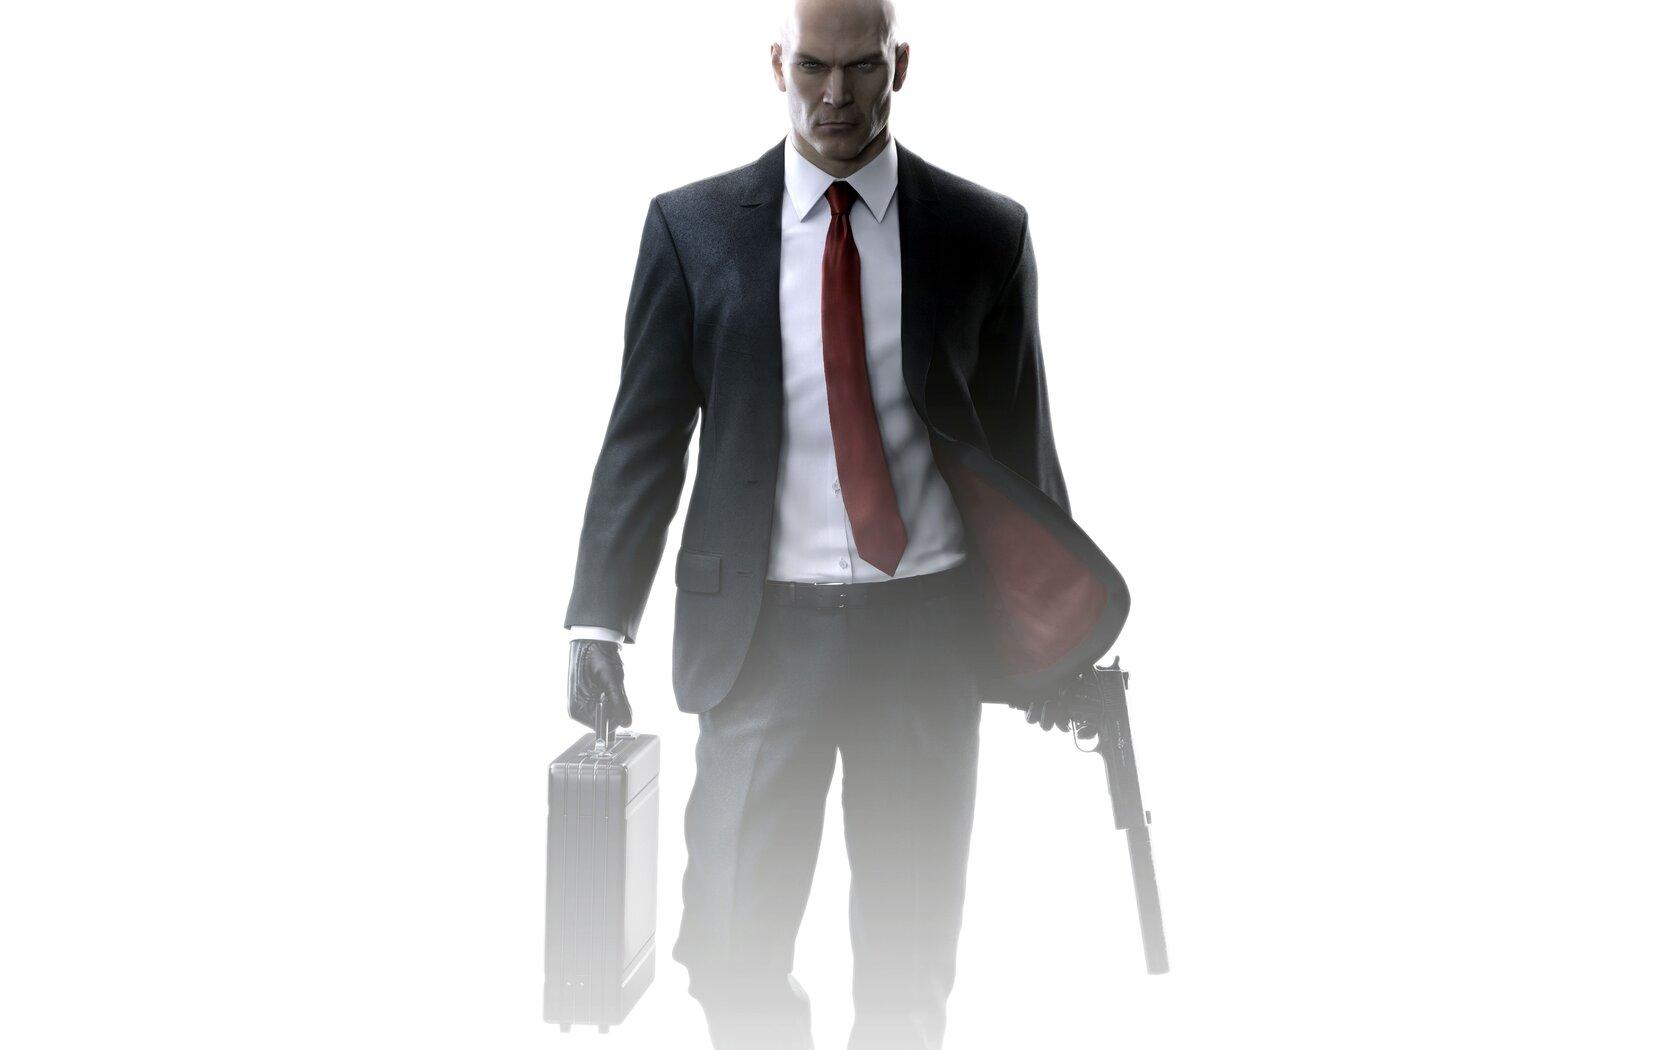 1680x1050 Hitman Agent 47 Game 1680x1050 Resolution Hd 4k